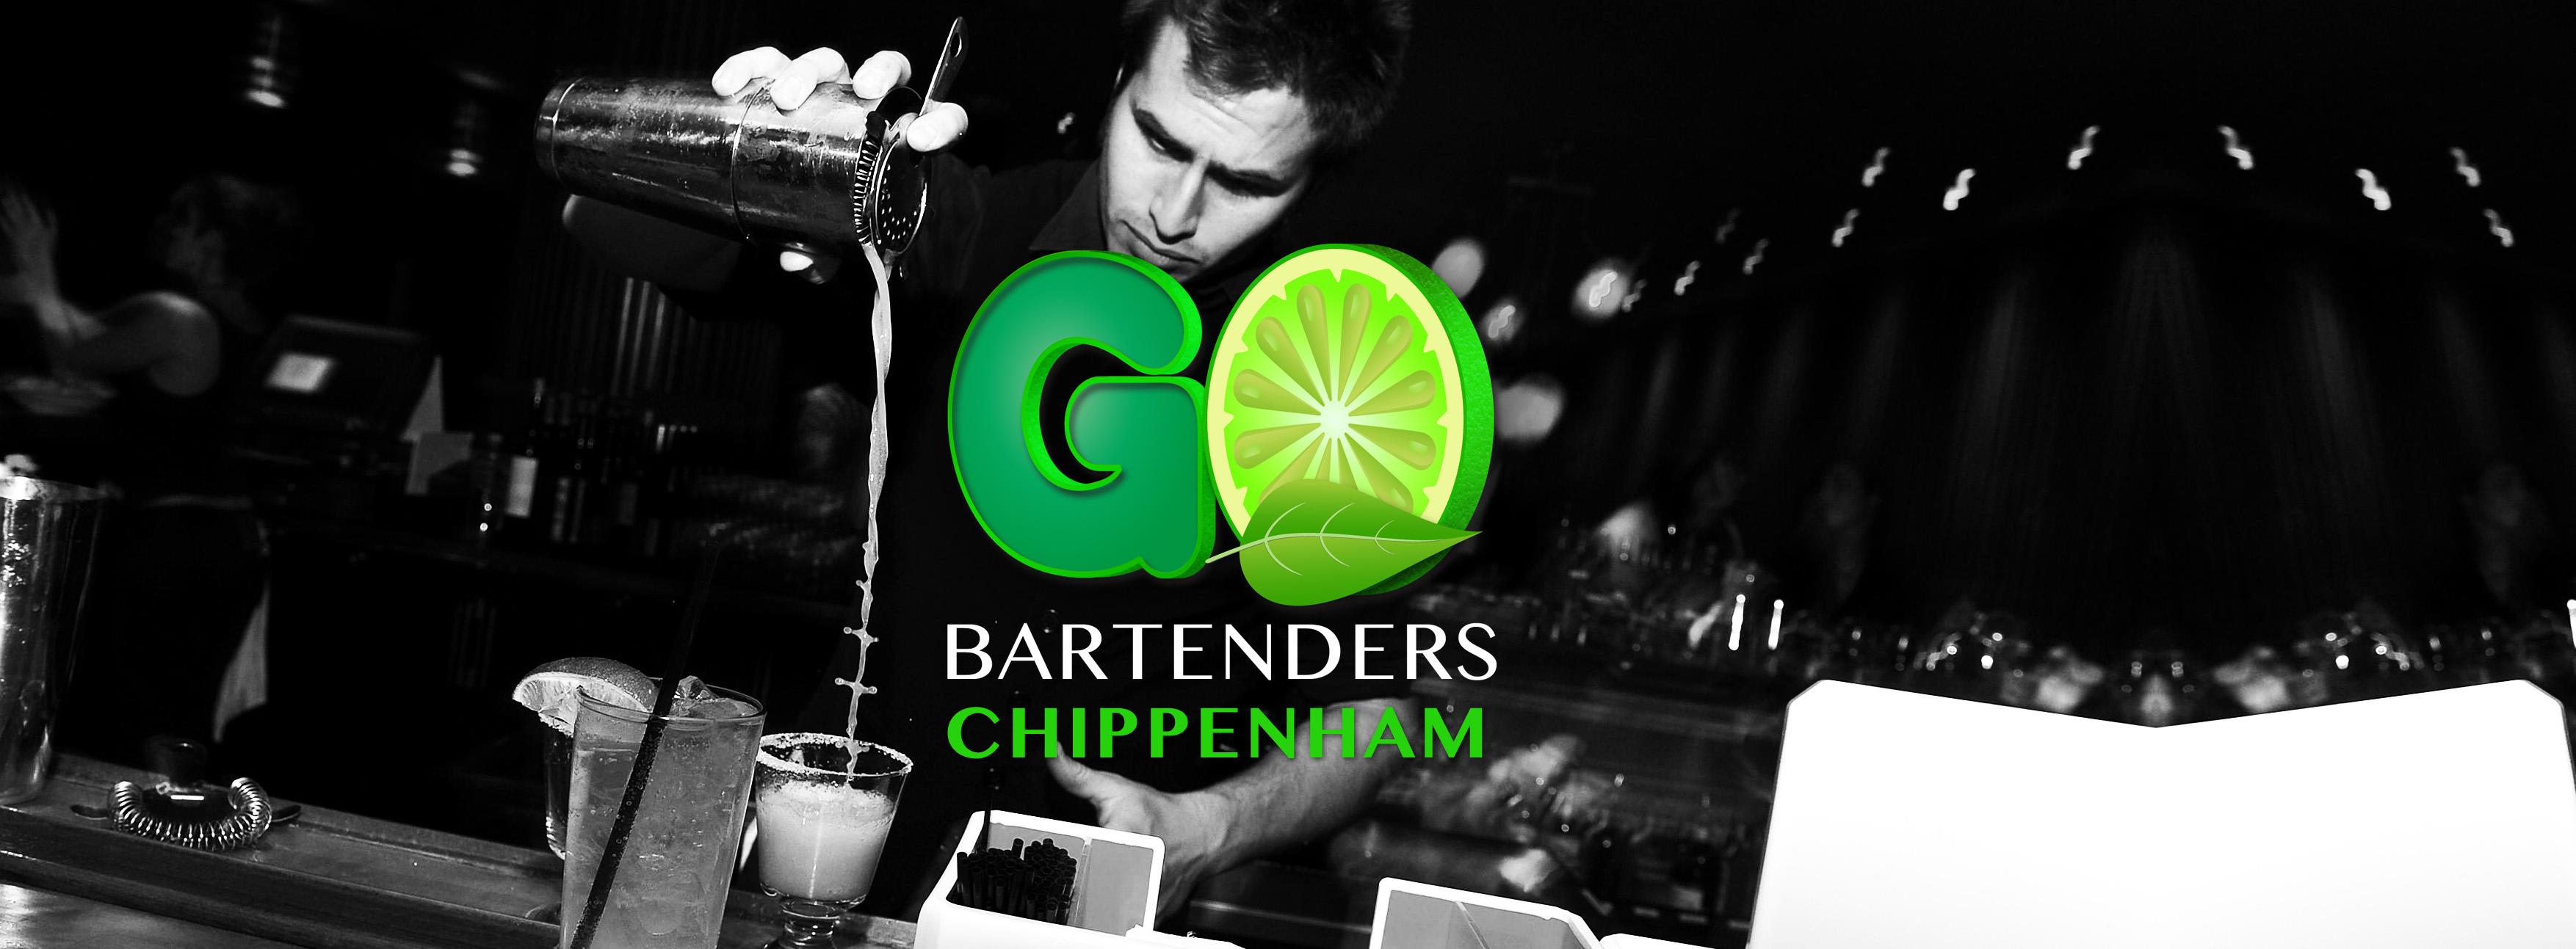 Chippenham cocktail service.